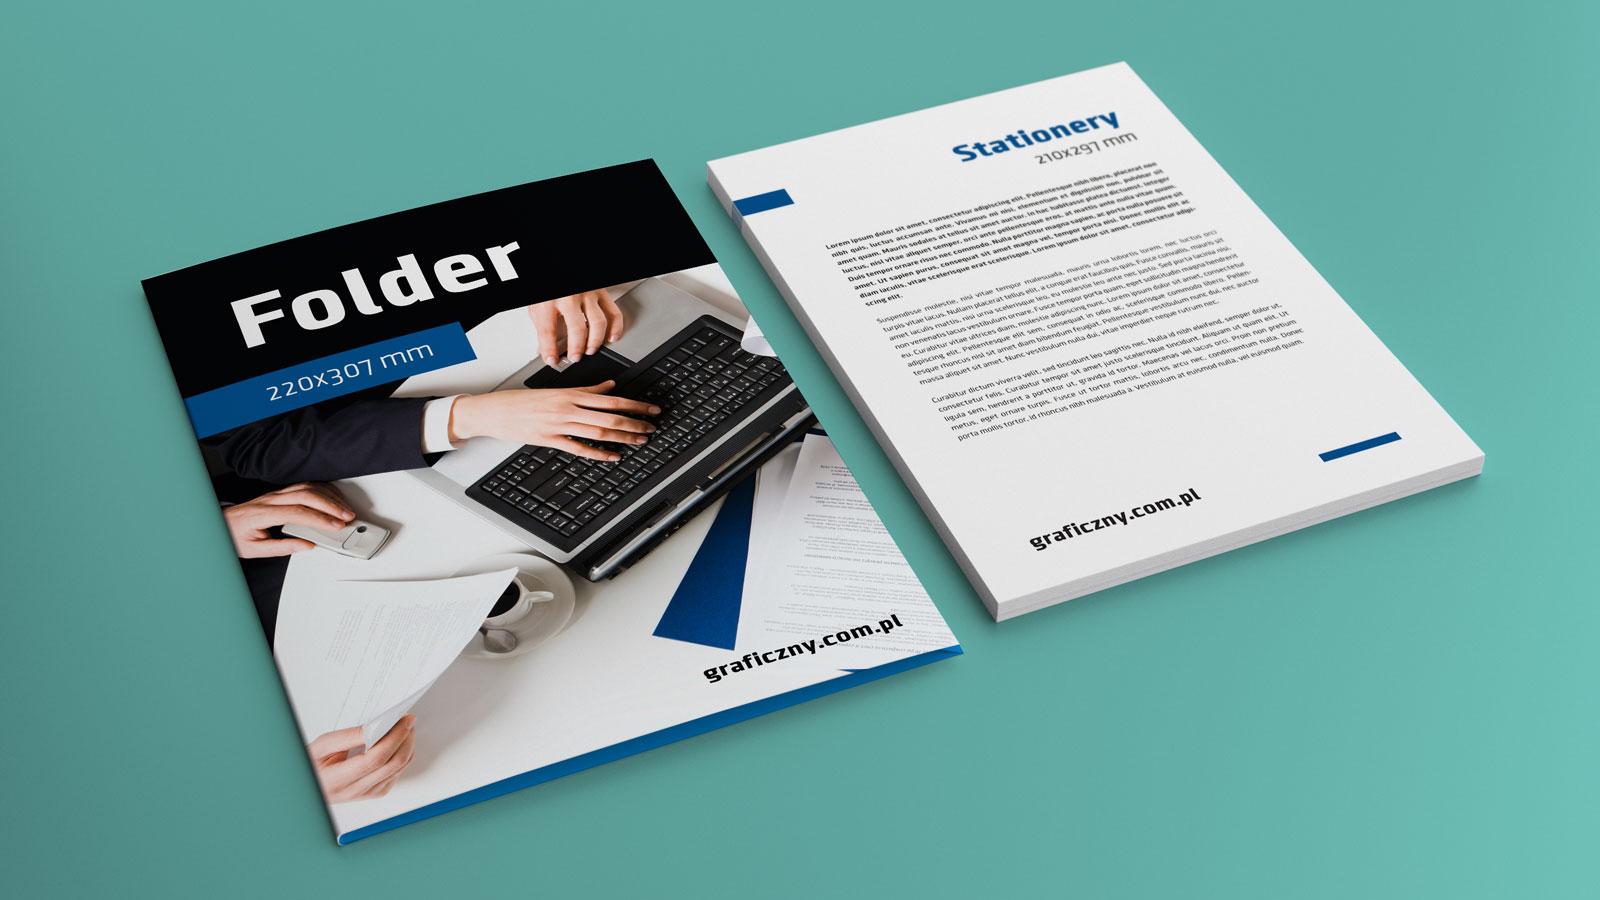 Free-Folder-Letterhead-Mockup-PSD